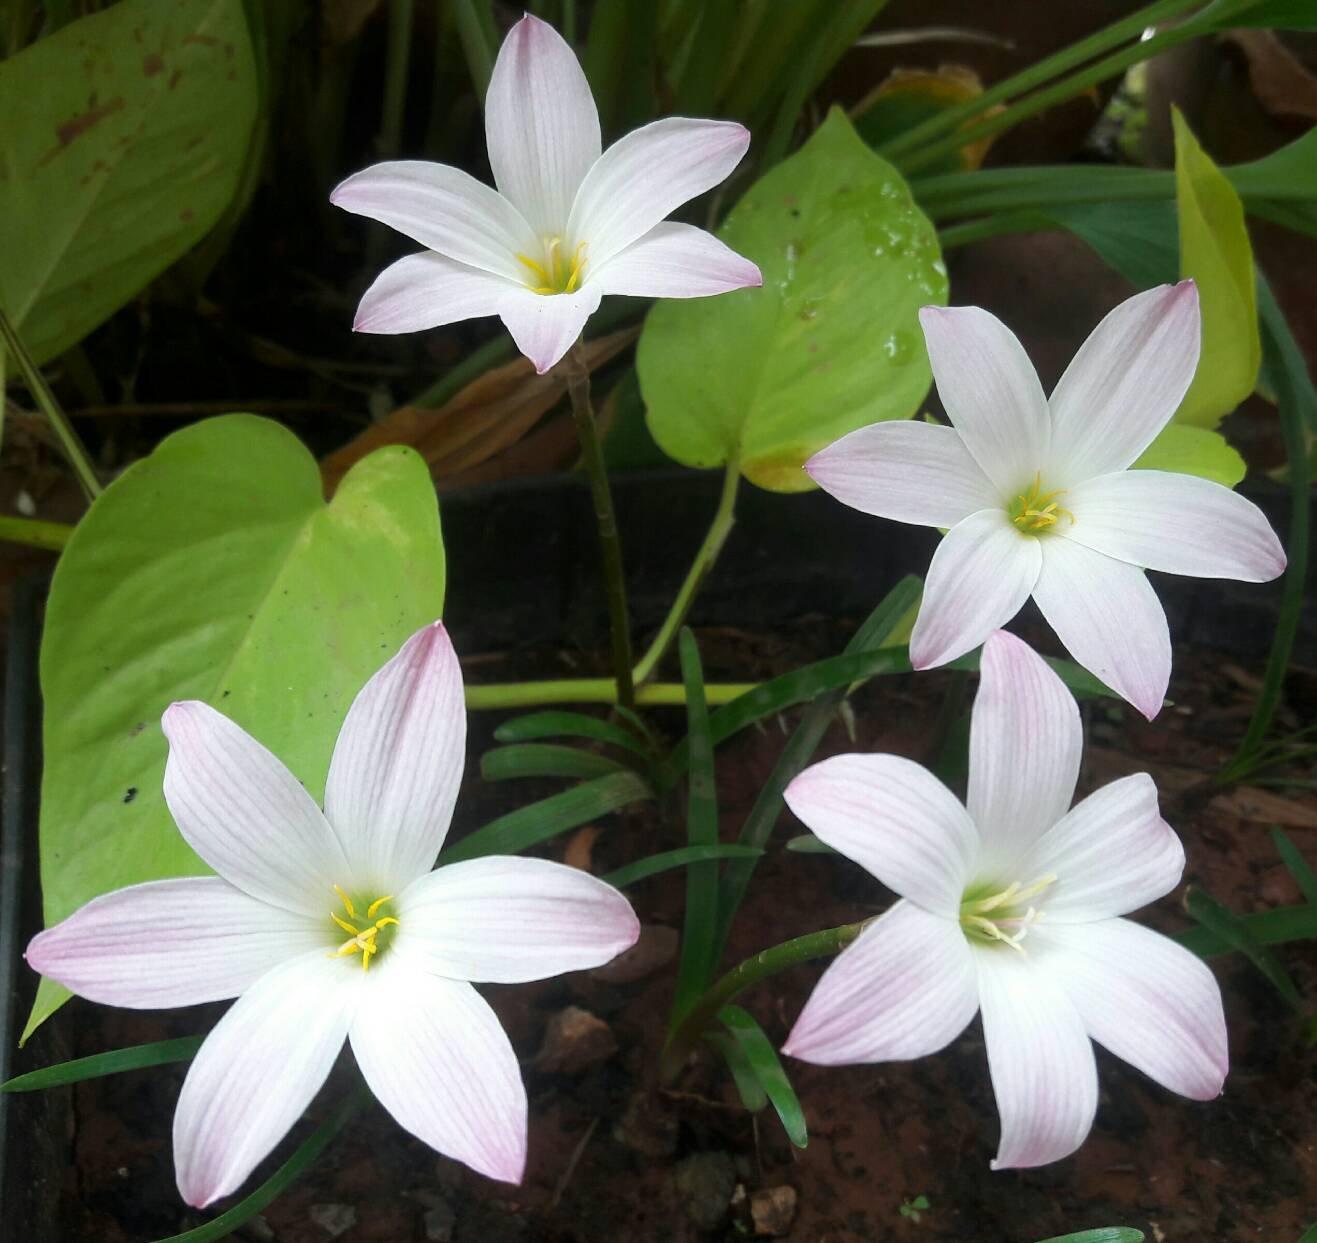 Amazon Rain Lily Bulb Zephyranthes Bubble Magic Lily